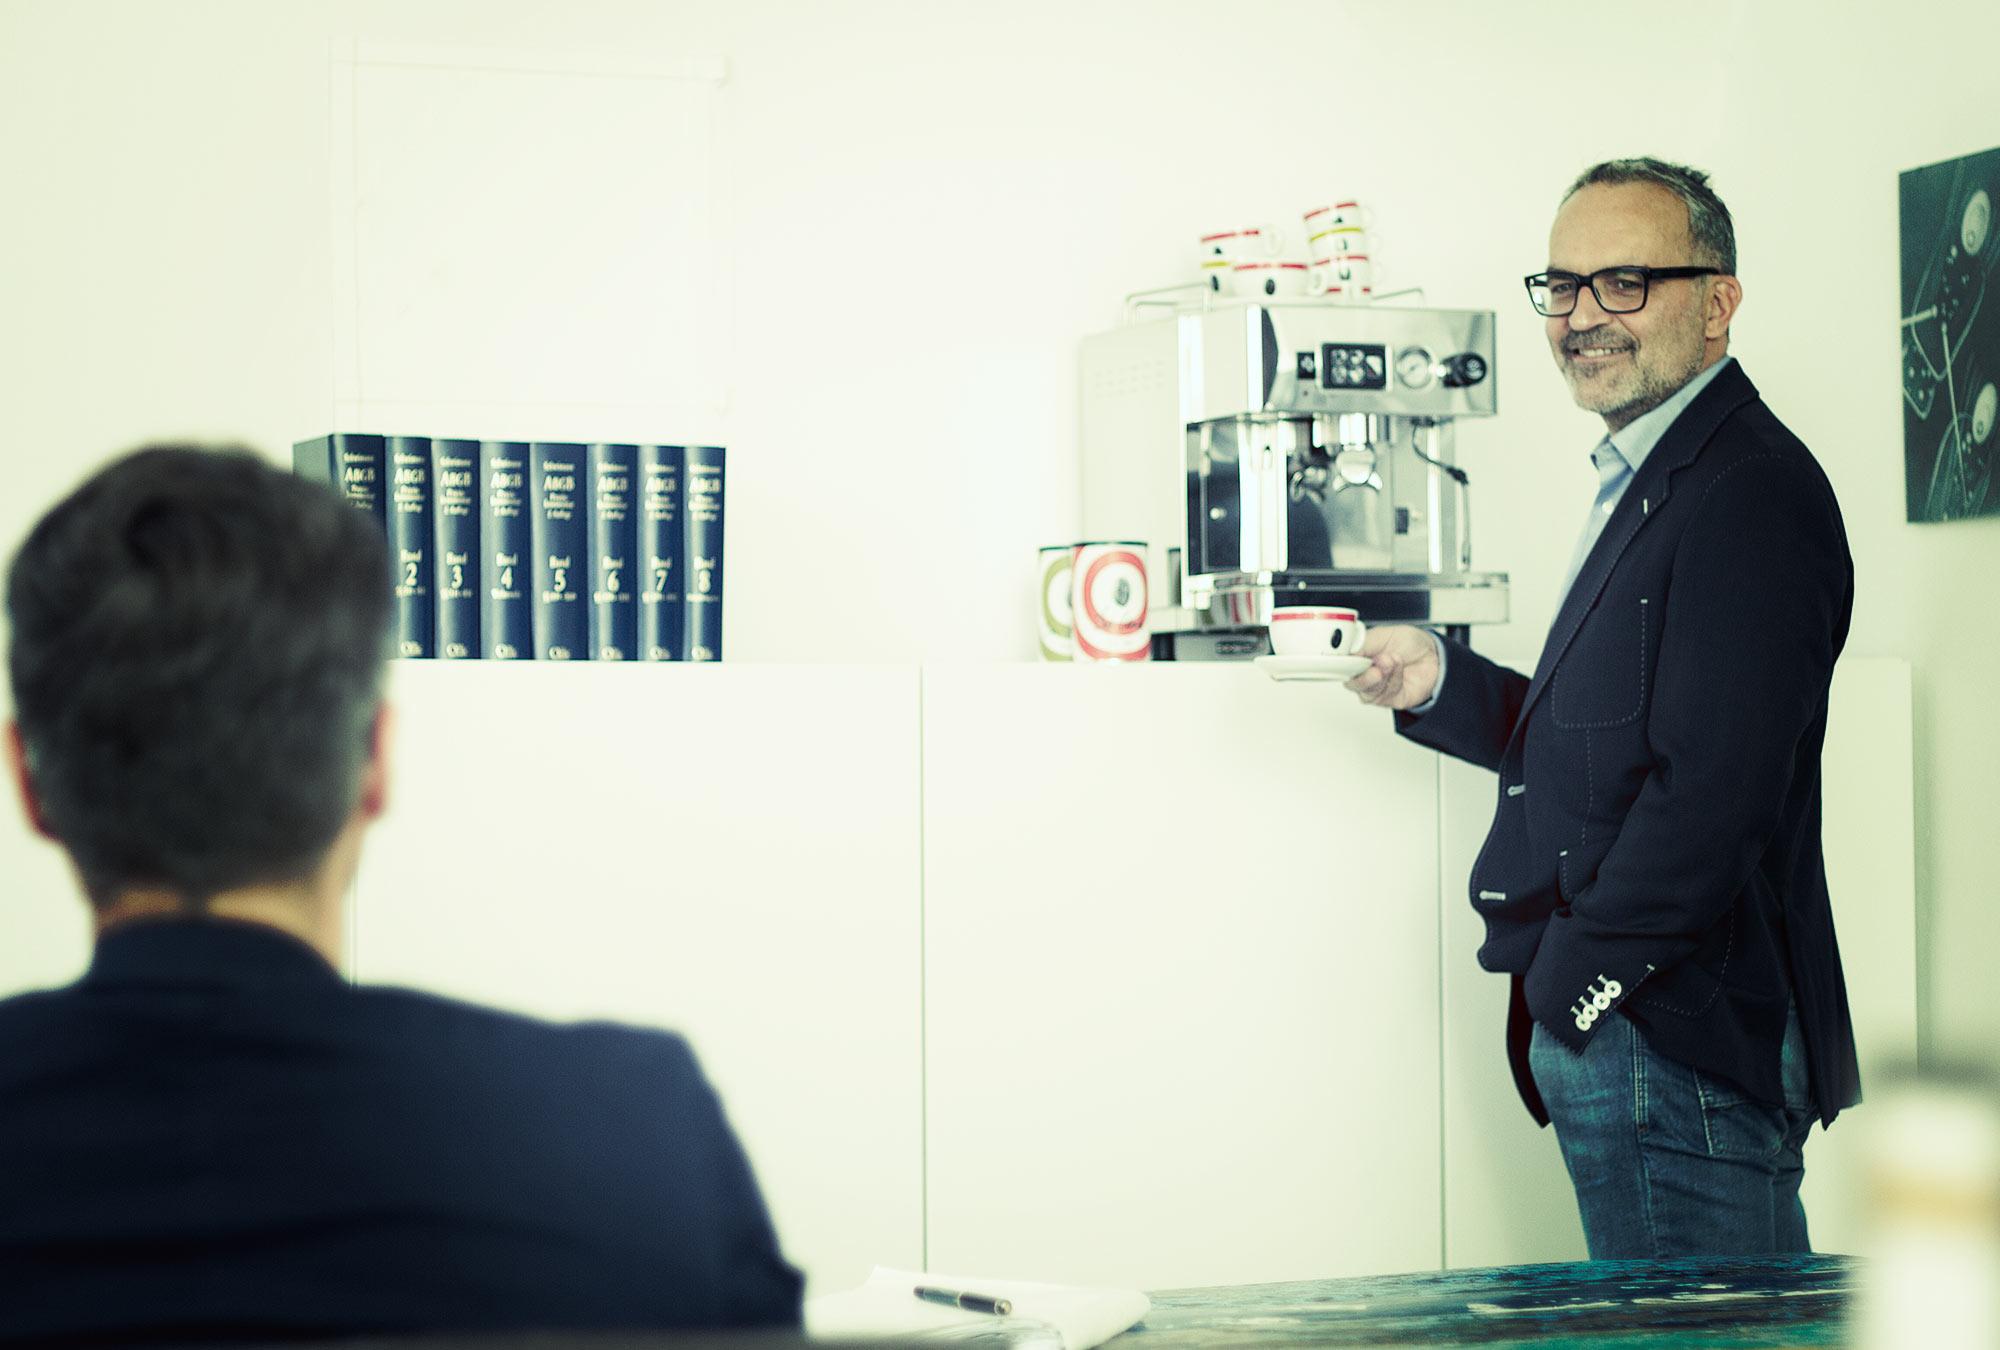 levinsky-kaffee-fuers-buero.jpg